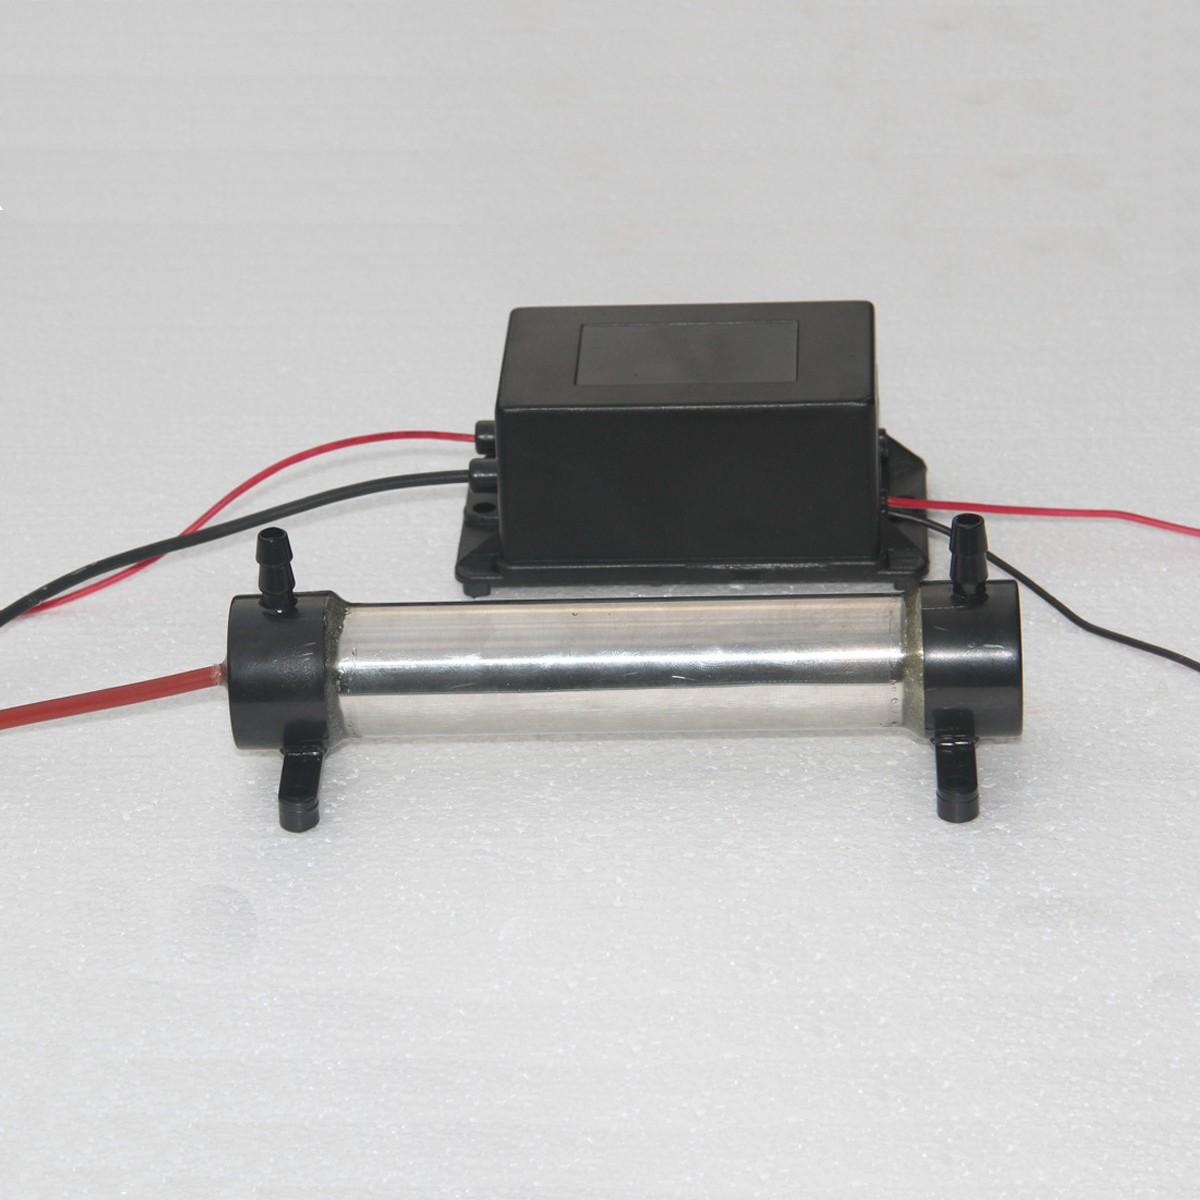 1g ozone generator kit